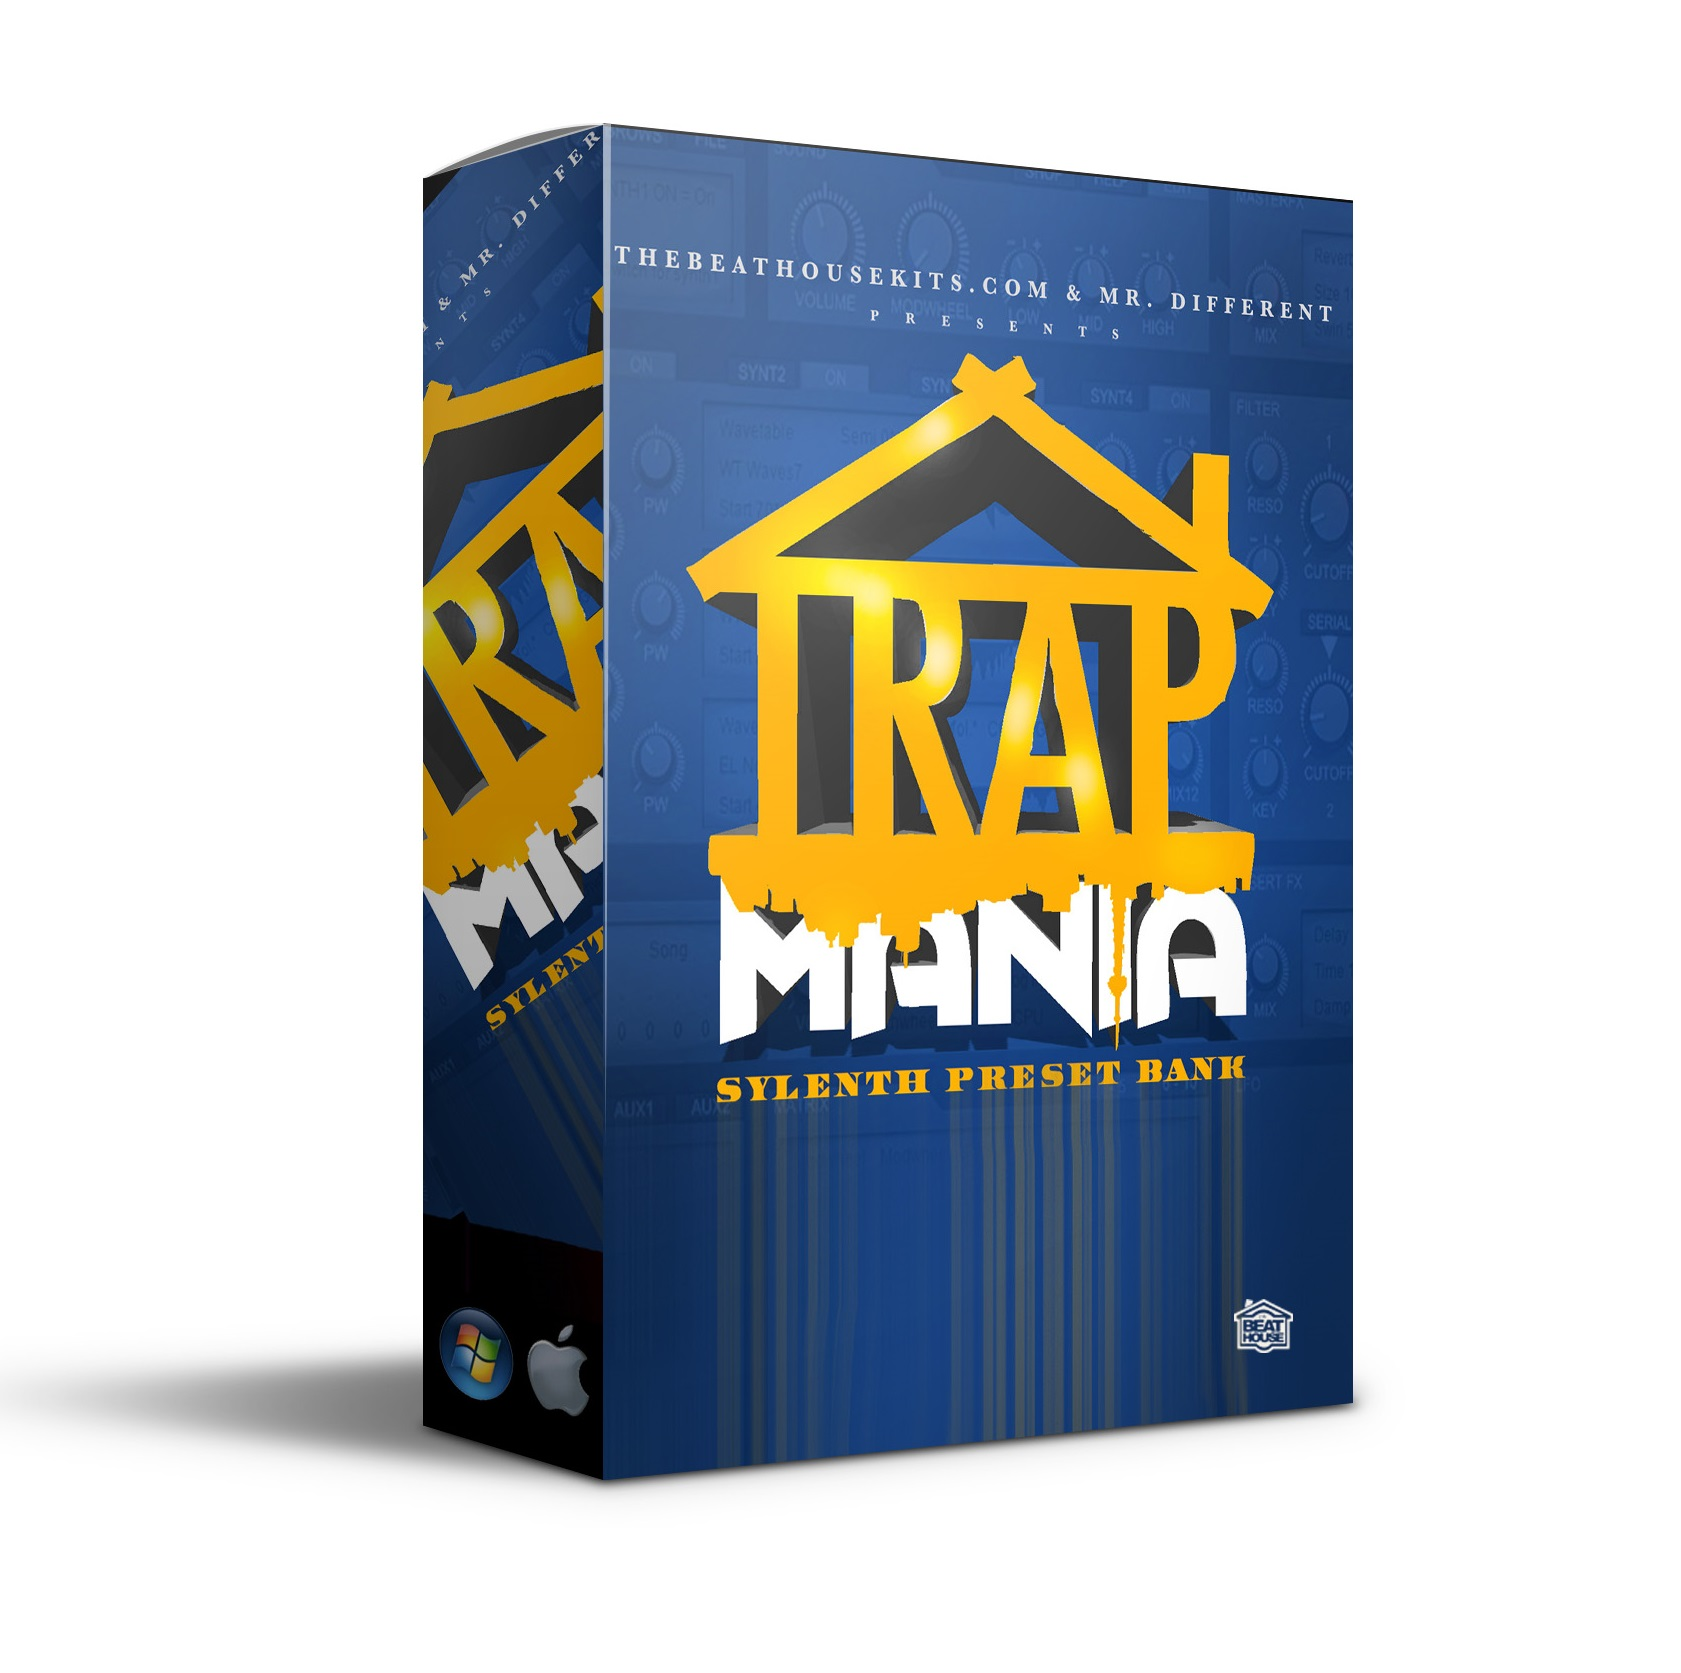 Trap Mania - Sylenth Presets - Download Music Loops, Sample Packs, VST  Presets & Libraries, Drumkits, Construction kits, Royalty Free